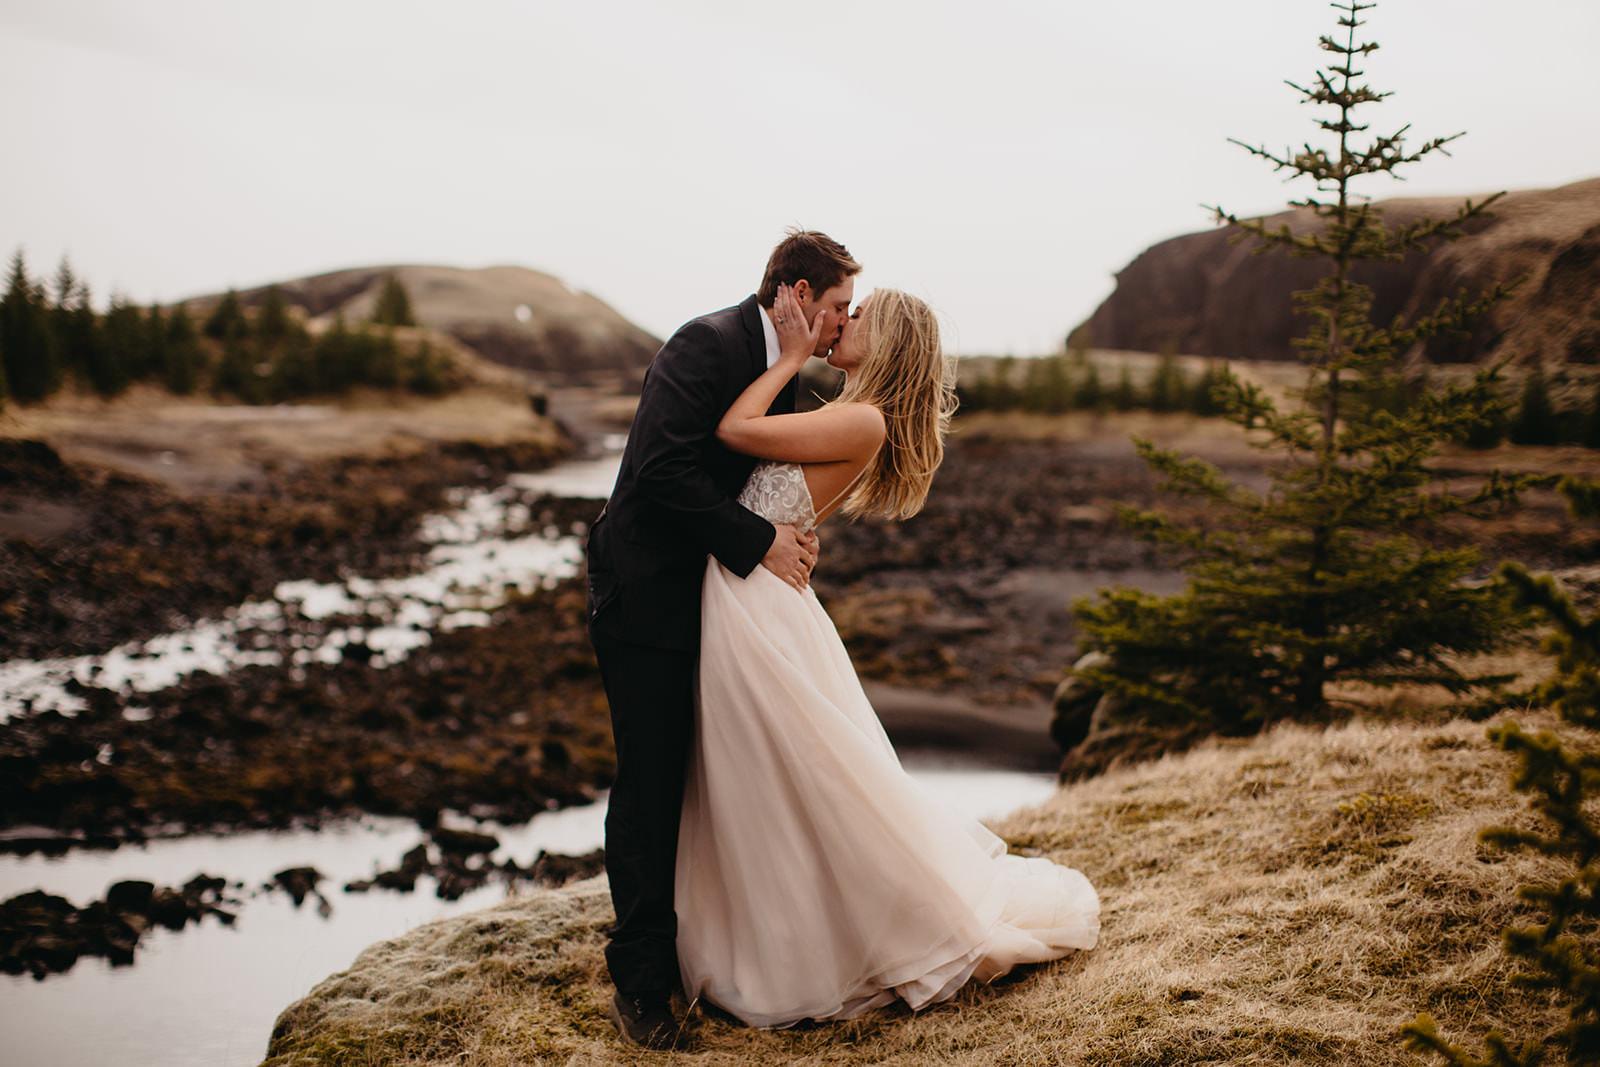 Icelandic Iceland Elopement Wedding Elope Photographer Eloping Reykjavík Vik Black Sand Beach Jökulsárlón Skogafoss Waterfall Vestrahorn Mountain Liz Osban Photography Destination 67.jpg